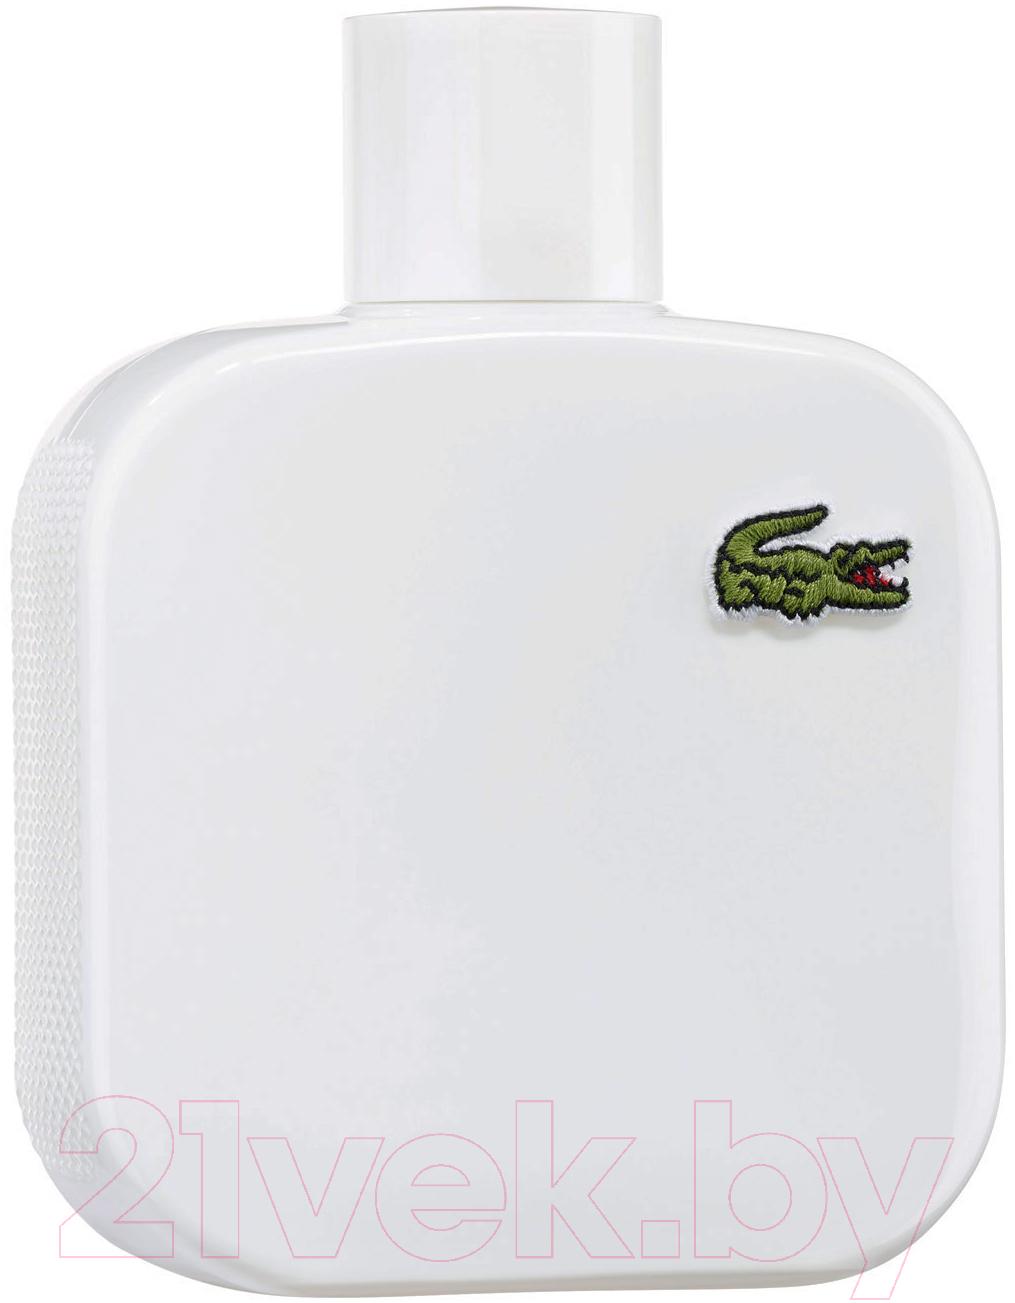 Купить Туалетная вода Lacoste, Eau De Lacoste L.12.12 Blanc (100мл), Швейцария, L.12.12 (Lacoste)